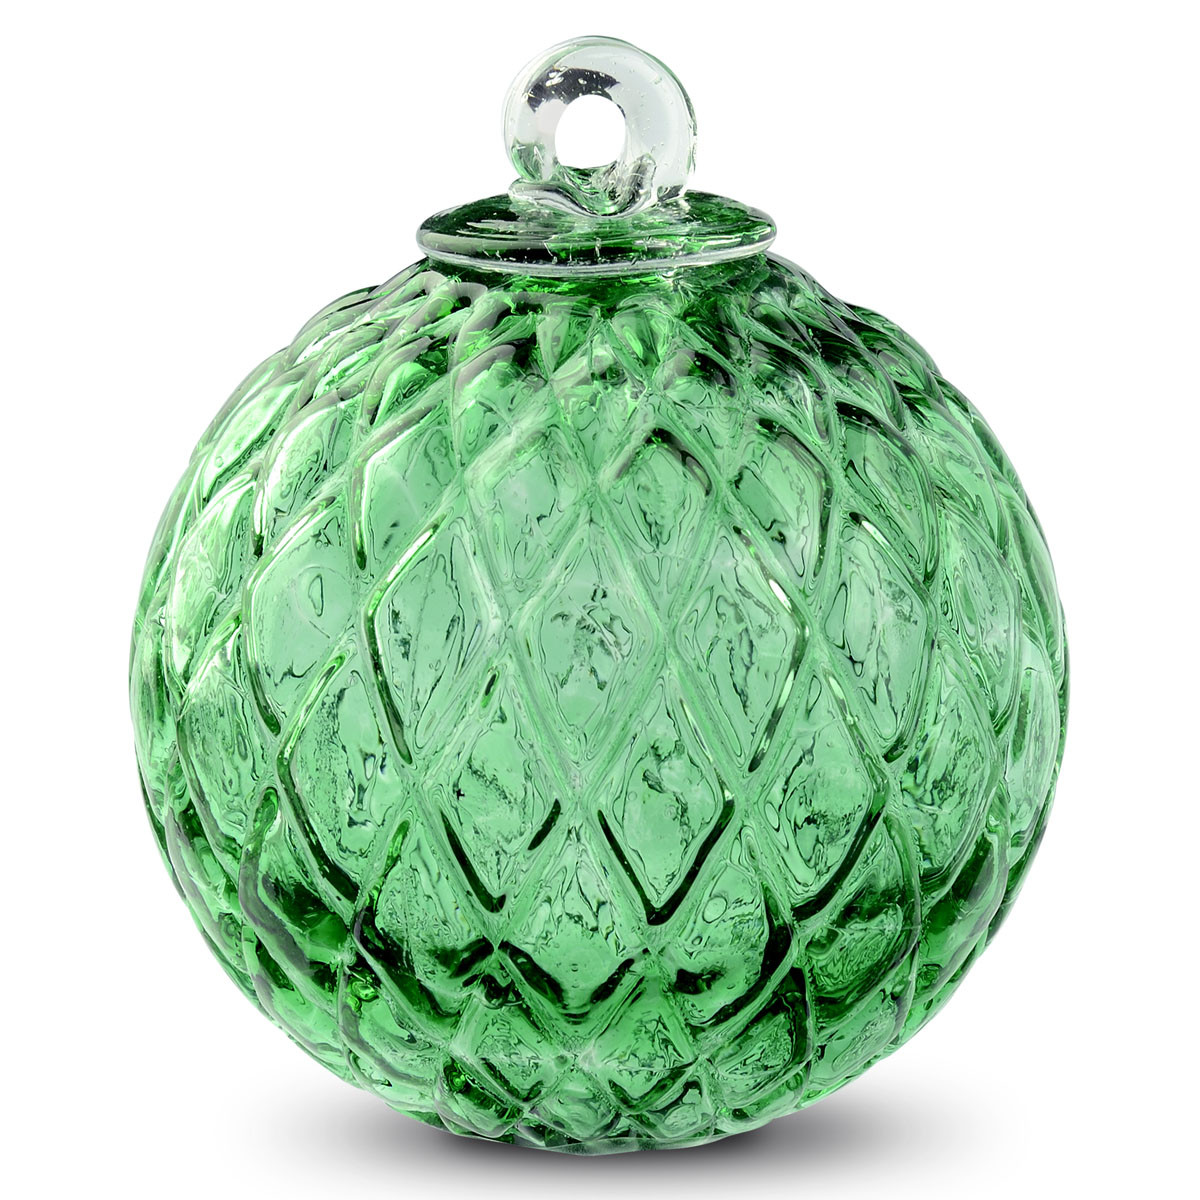 Friendship ball ornament - Diamond Optic Friendship Ball Moss Green 4 Inch